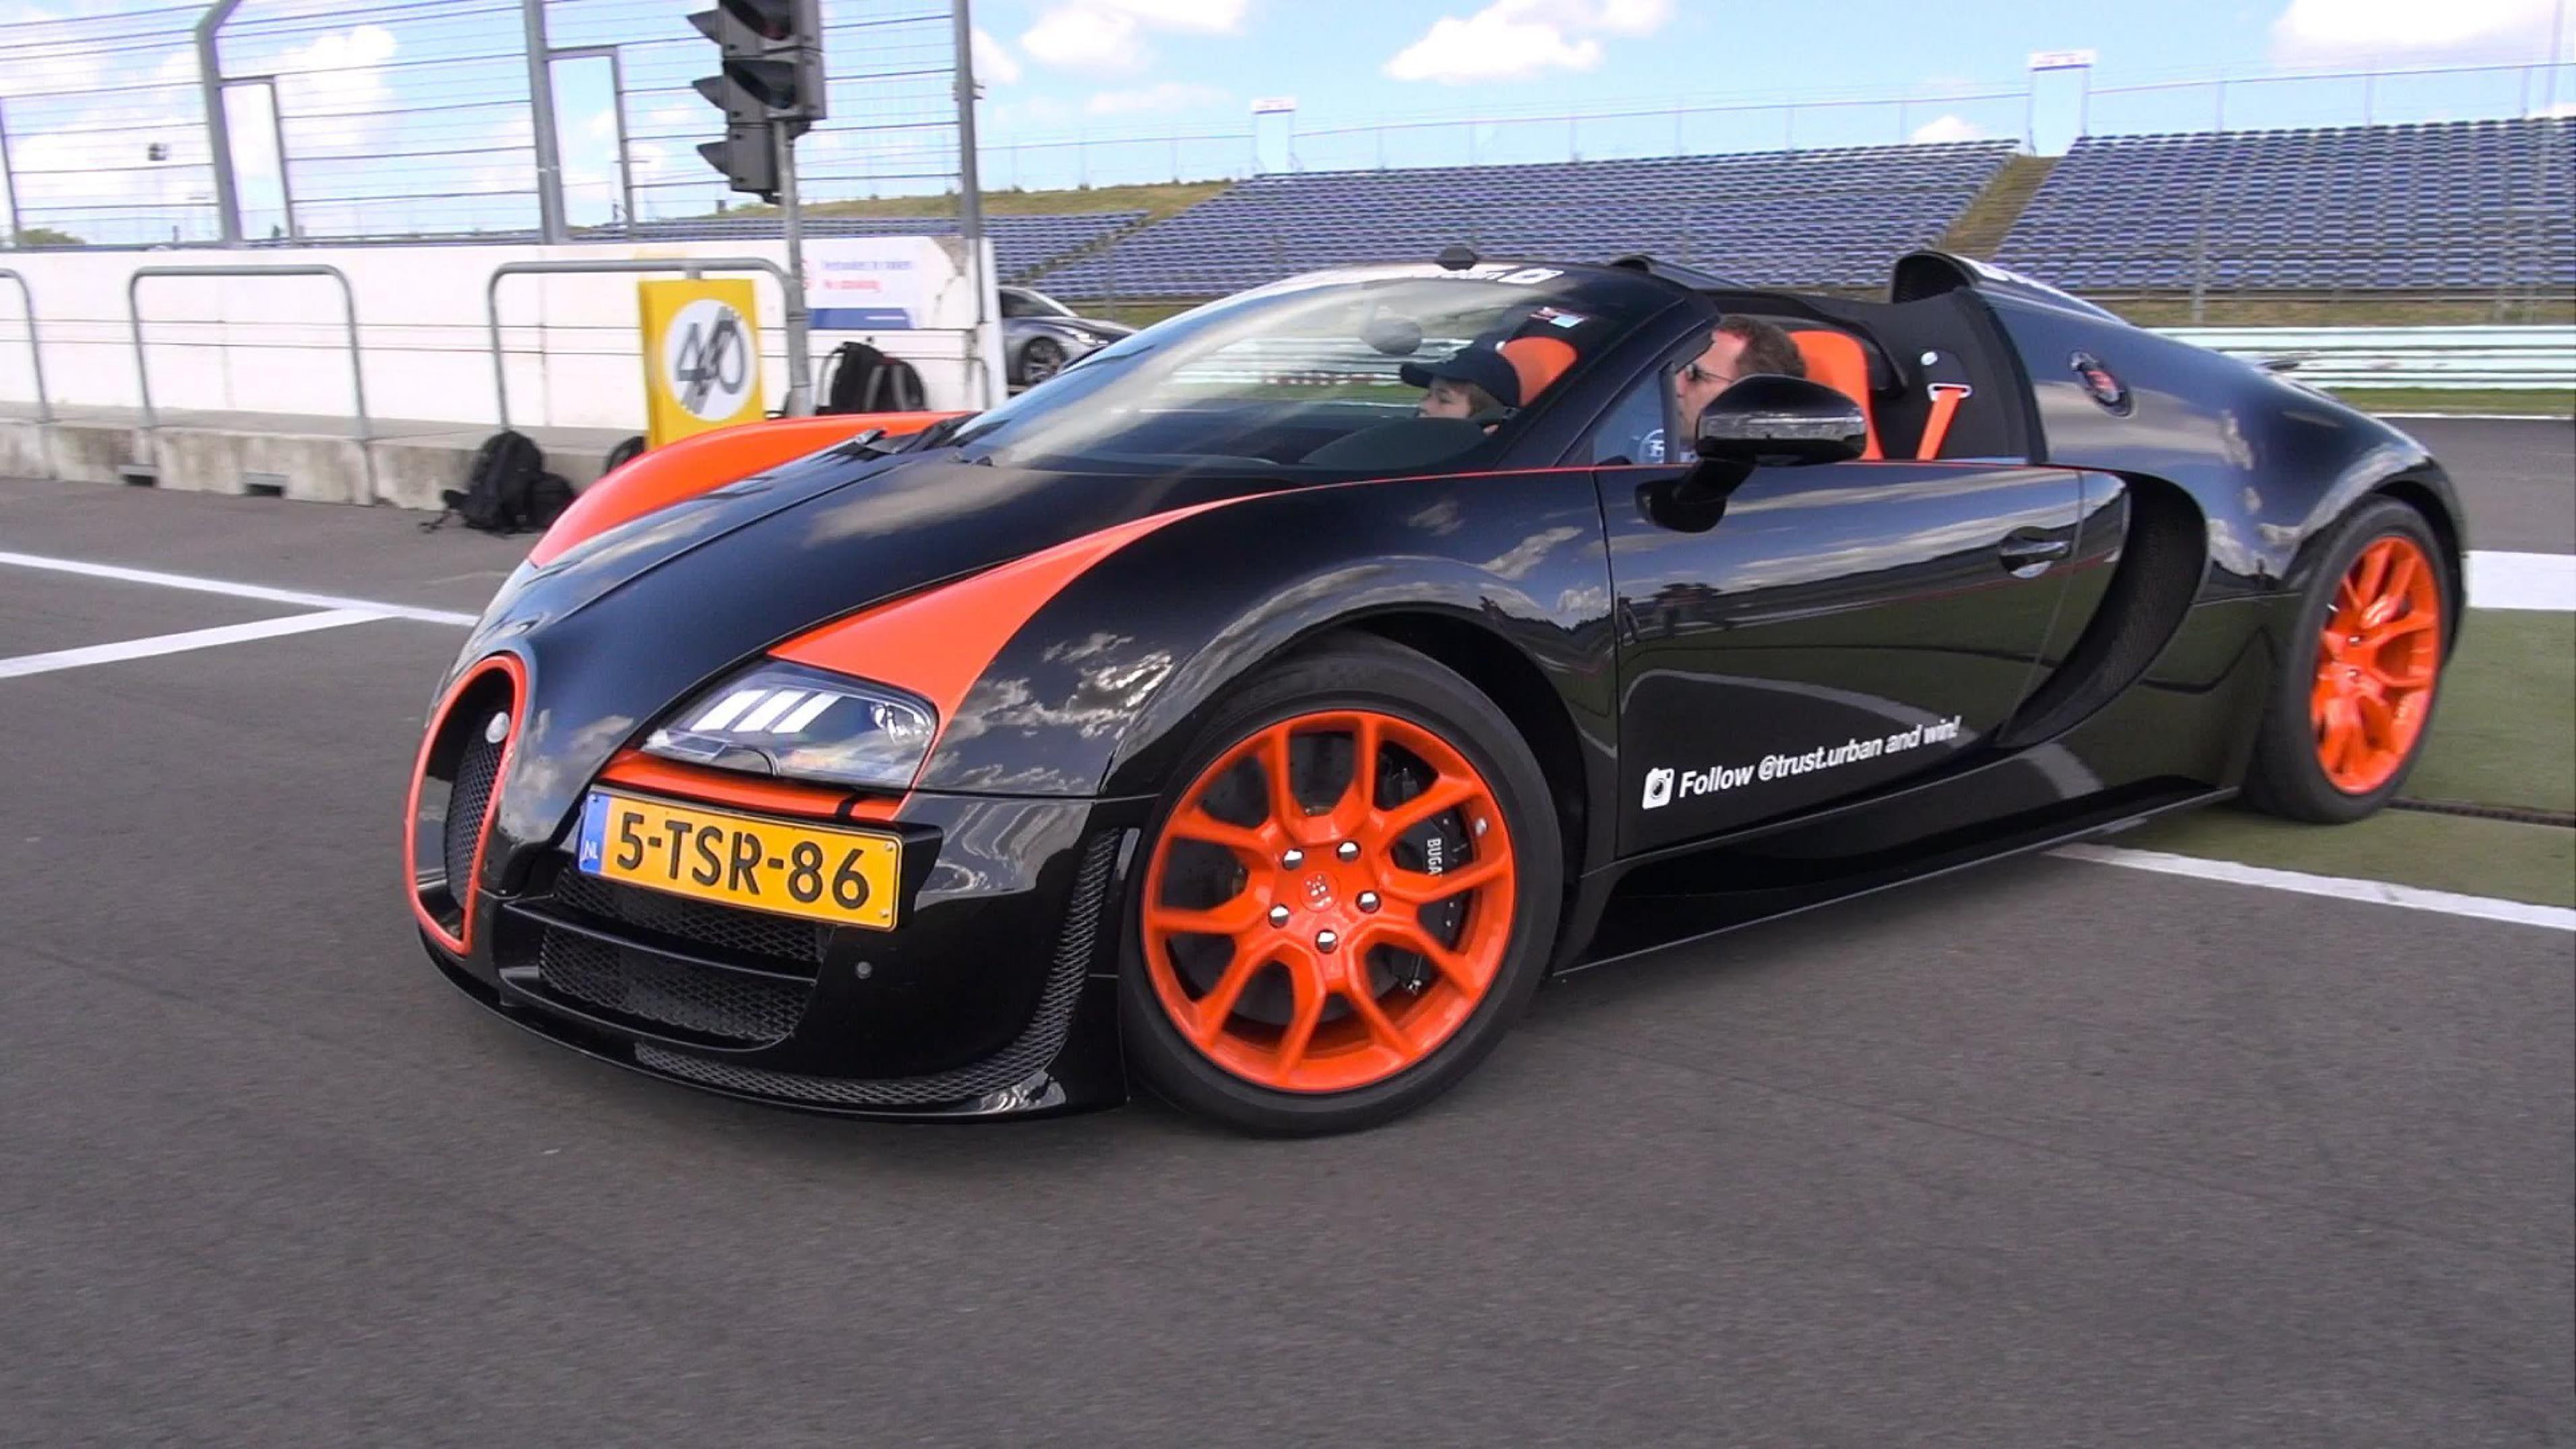 7e91b56e4fc2f353de77c1eabd6d989f Fascinating Bugatti Veyron Grand Sport Vitesse 1/4 Mile Cars Trend